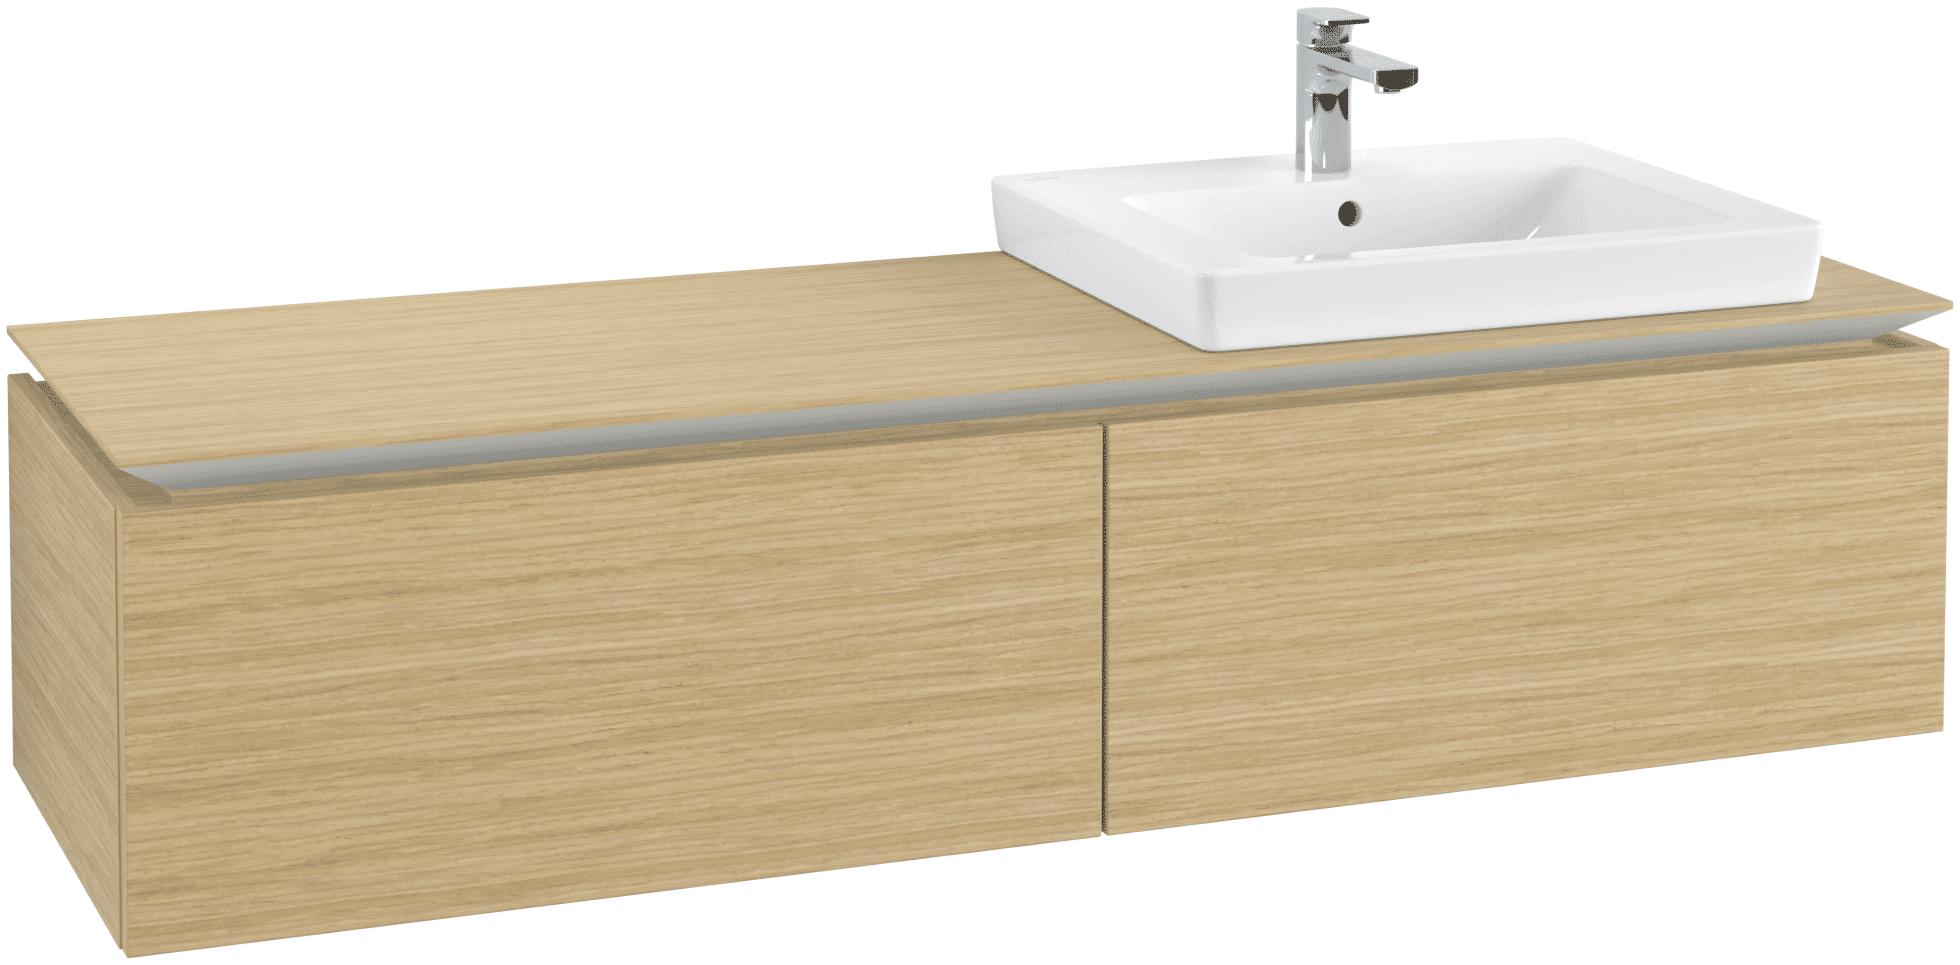 Villeroy & Boch Villeroy & Boch Legato - Meuble sous lavabo with 2 drawers & 1 cut-out right 1600 x 380 x 500mm nordic oak